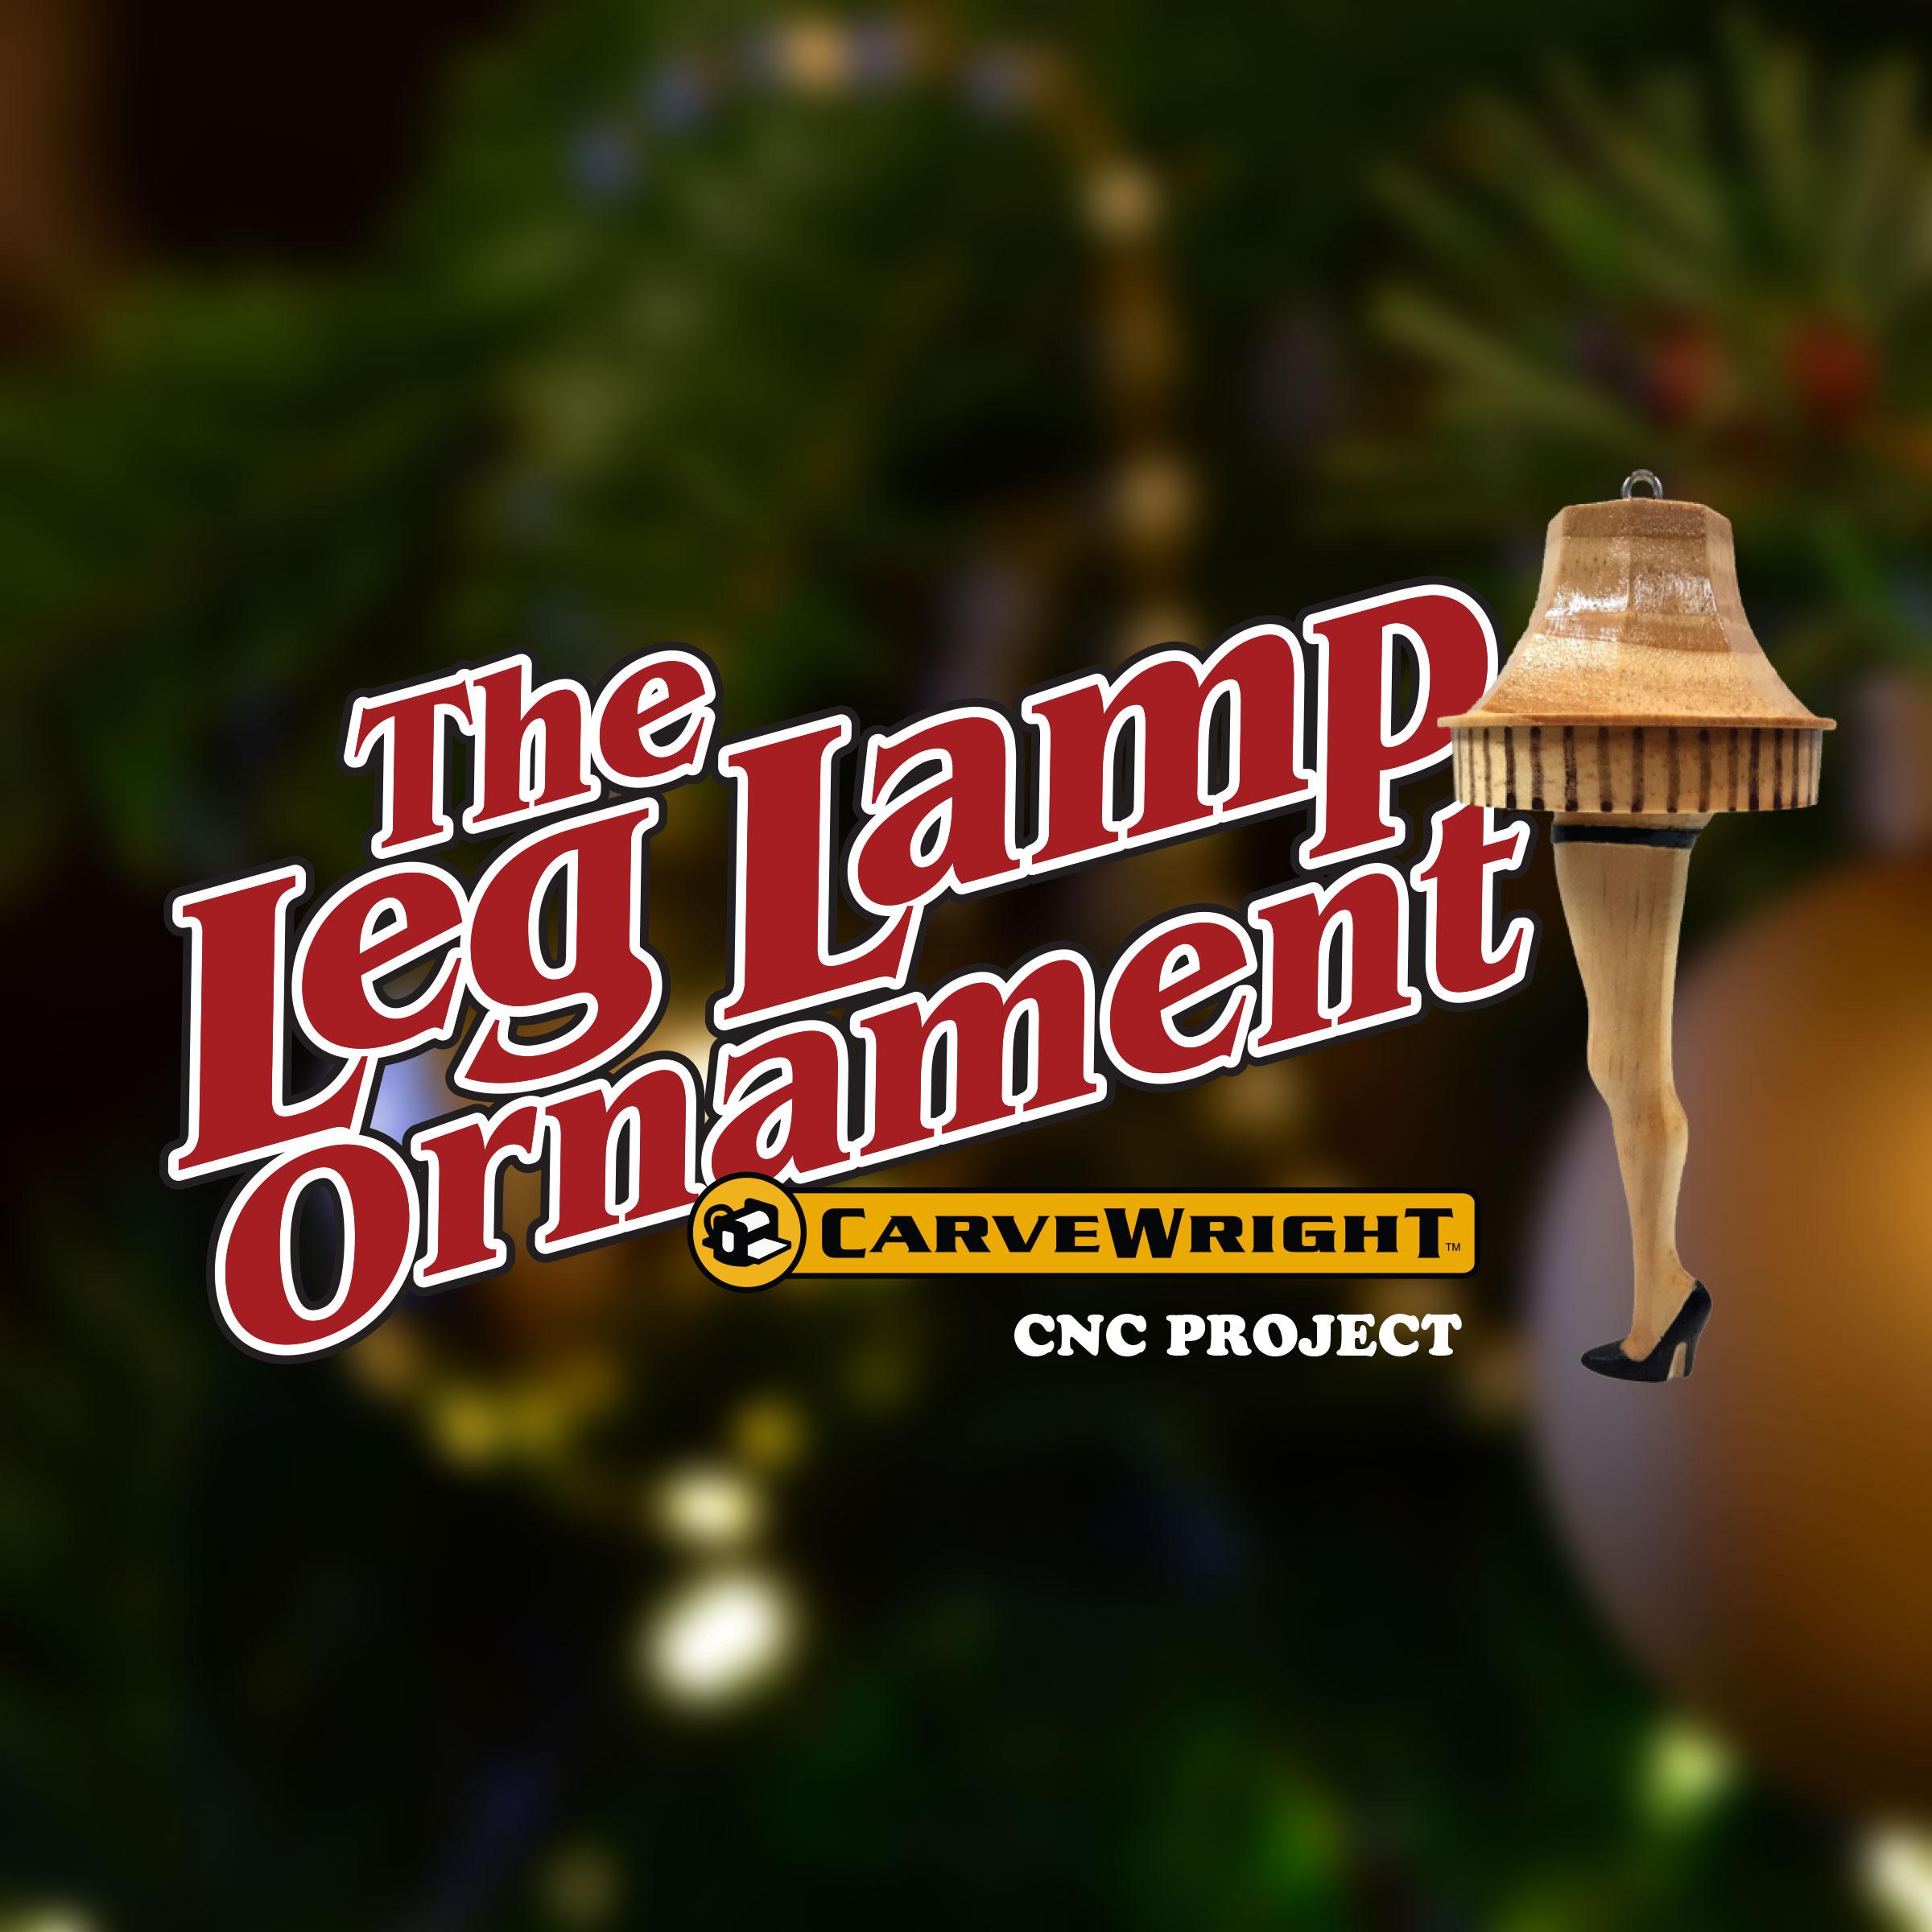 Leg Lamp Christmas Ornament Carvewright